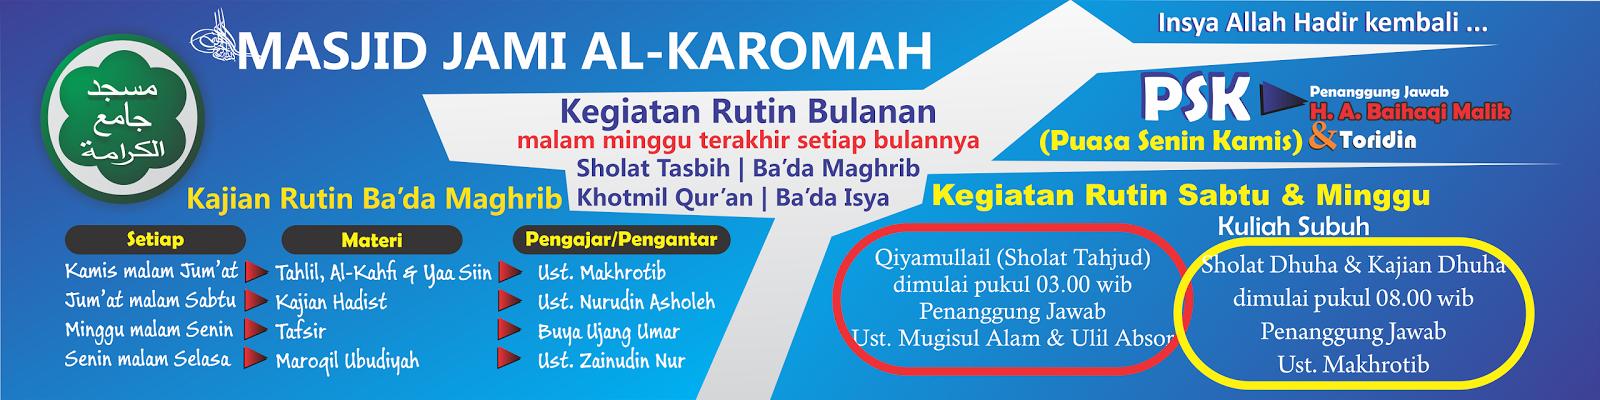 jadwal kegiatan masjid alkaromah